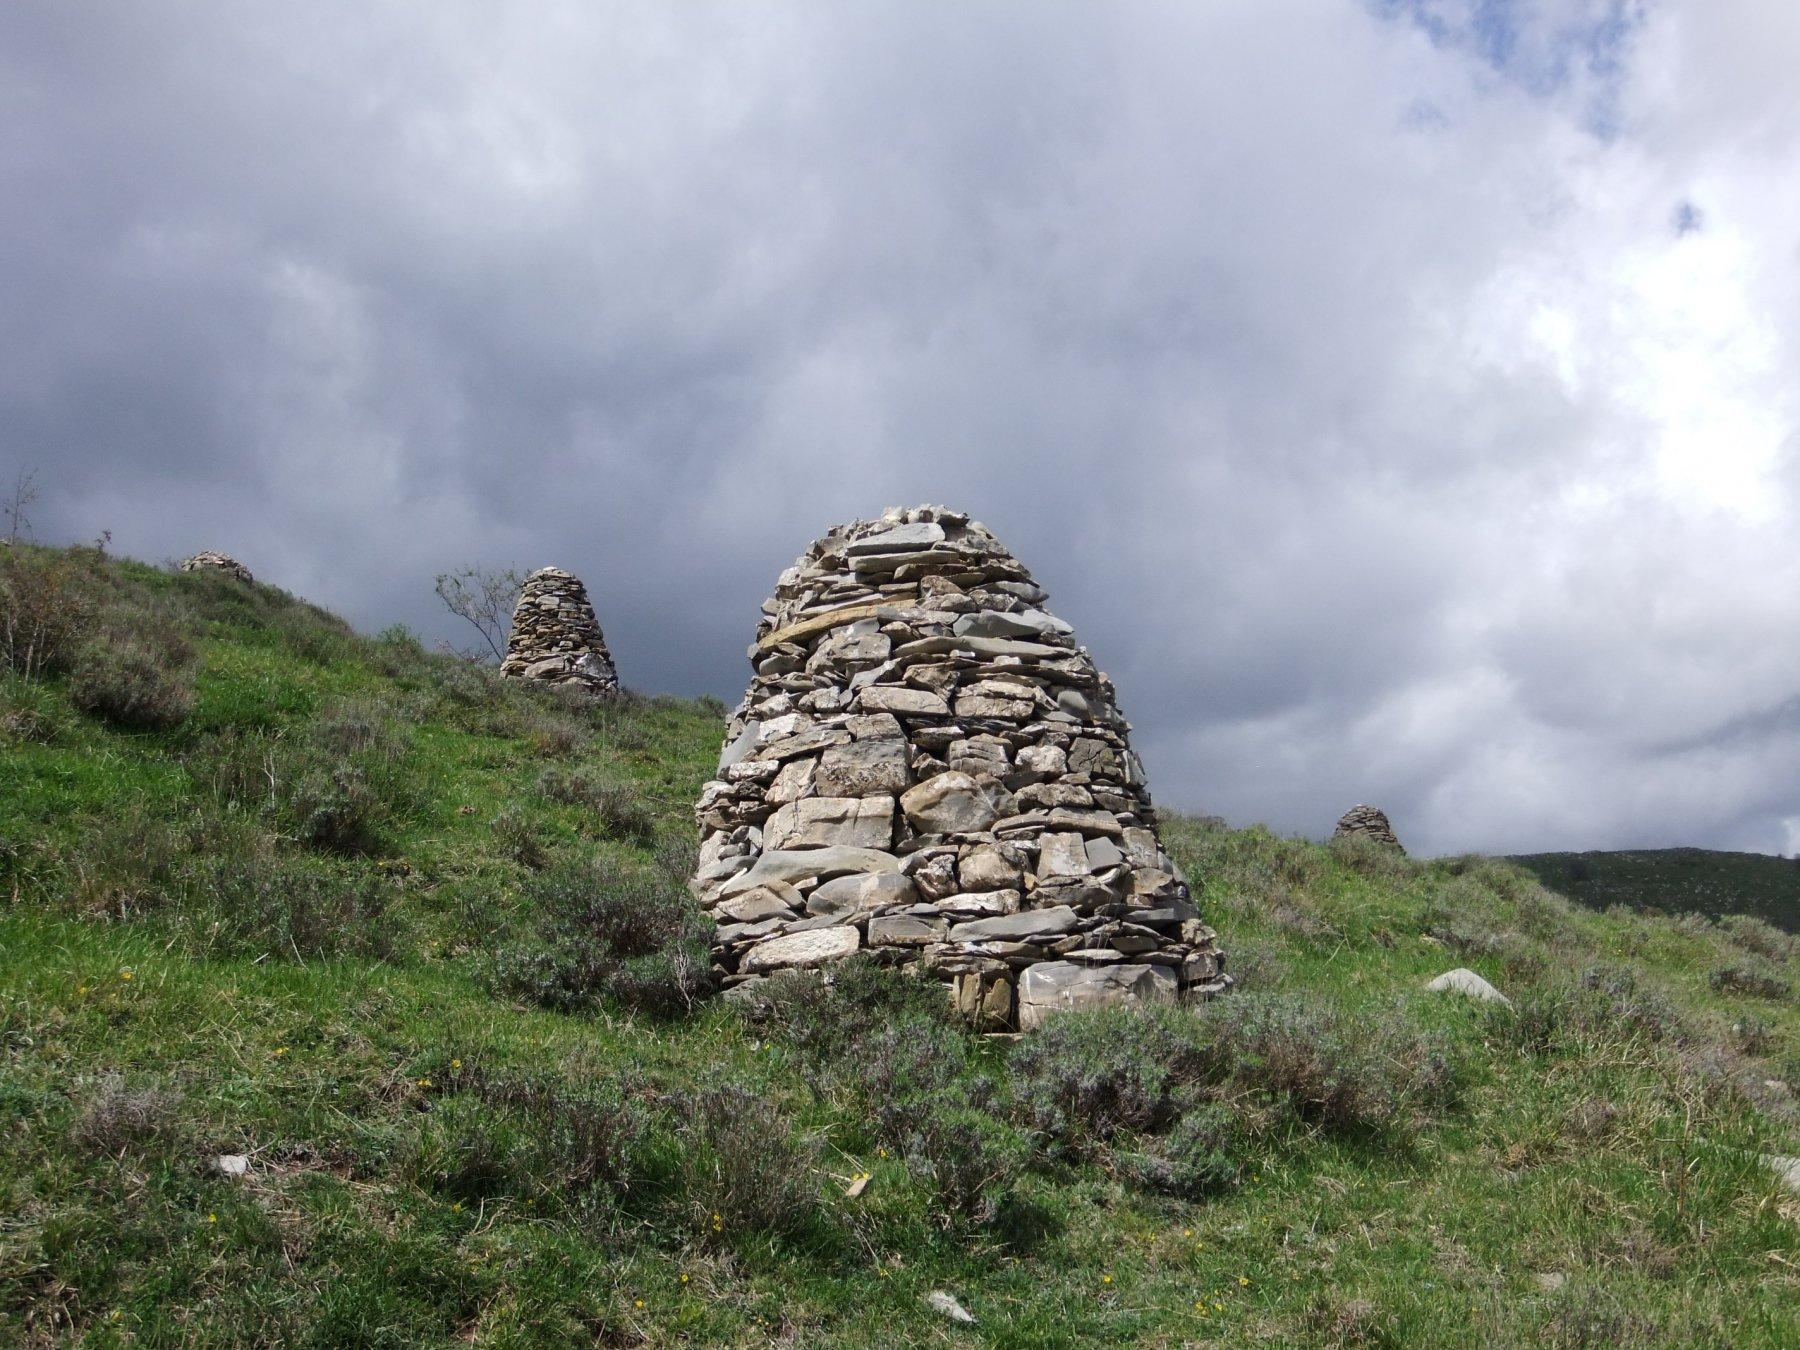 I numerosi piloni di pietre